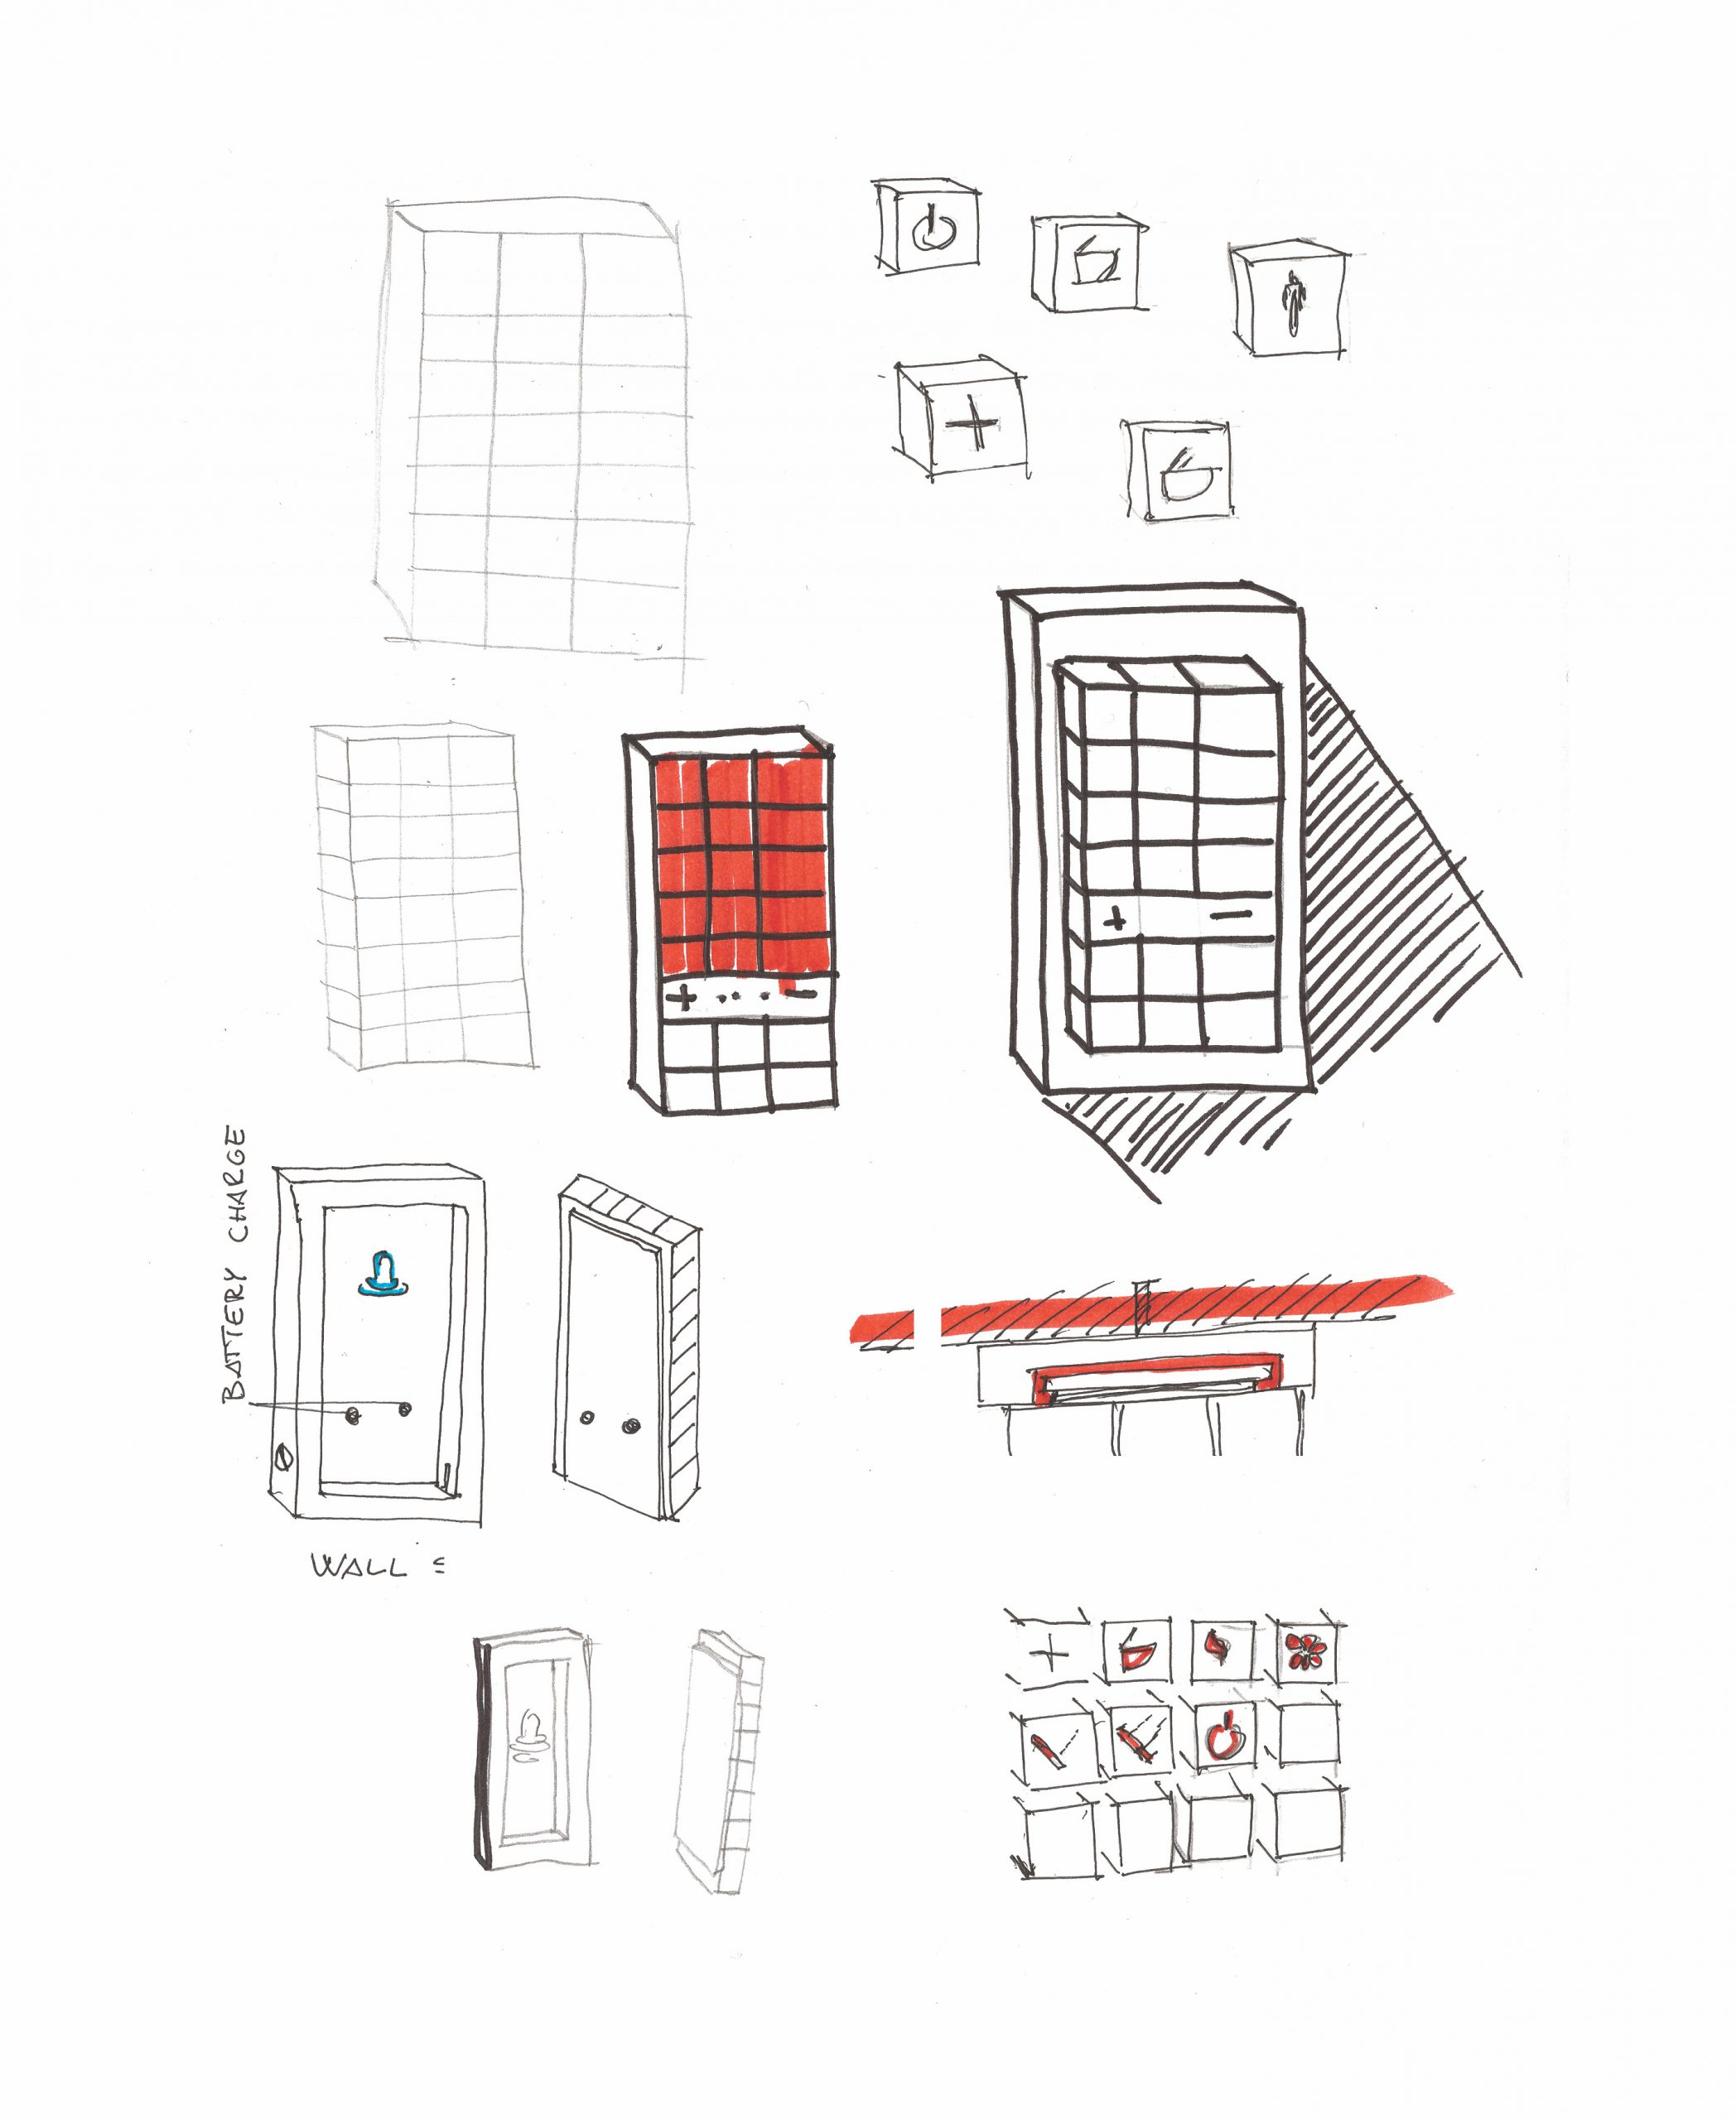 Sketch of the ViClean remote control series designed by Debiasi Sandri for Villeroy & Boch